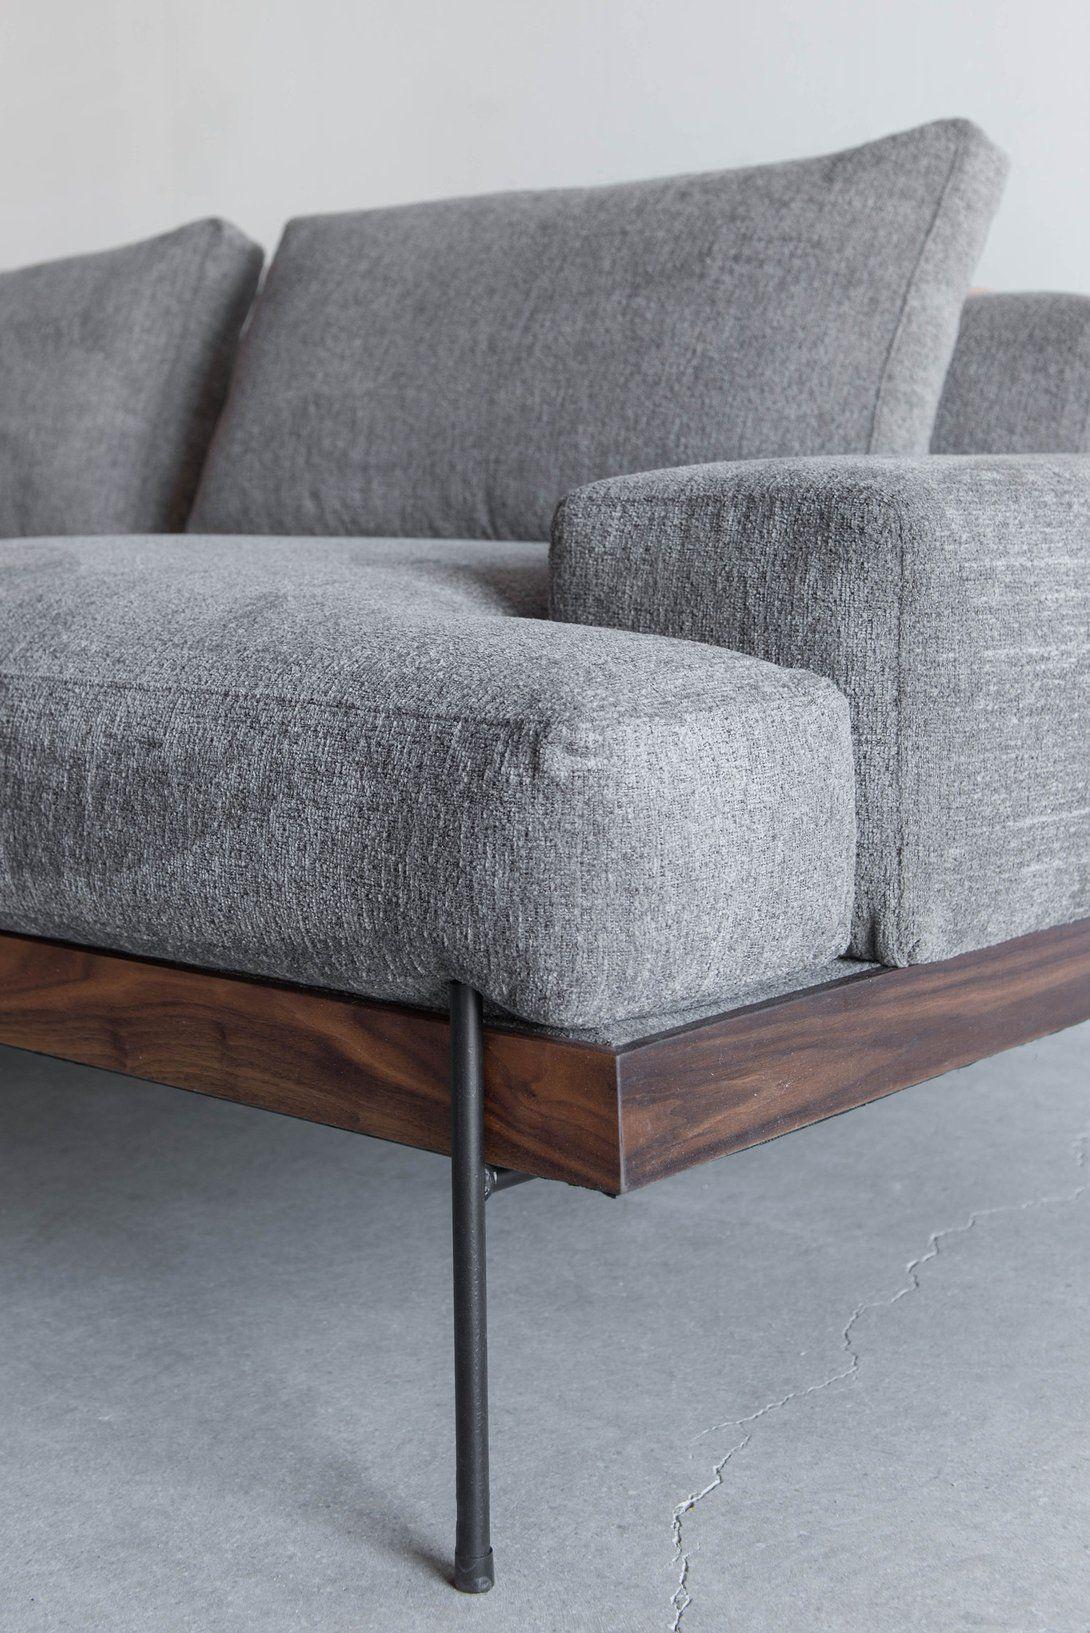 Rivera Sofa In 2020 Luxury Sofa Design Luxury Sofa Furniture